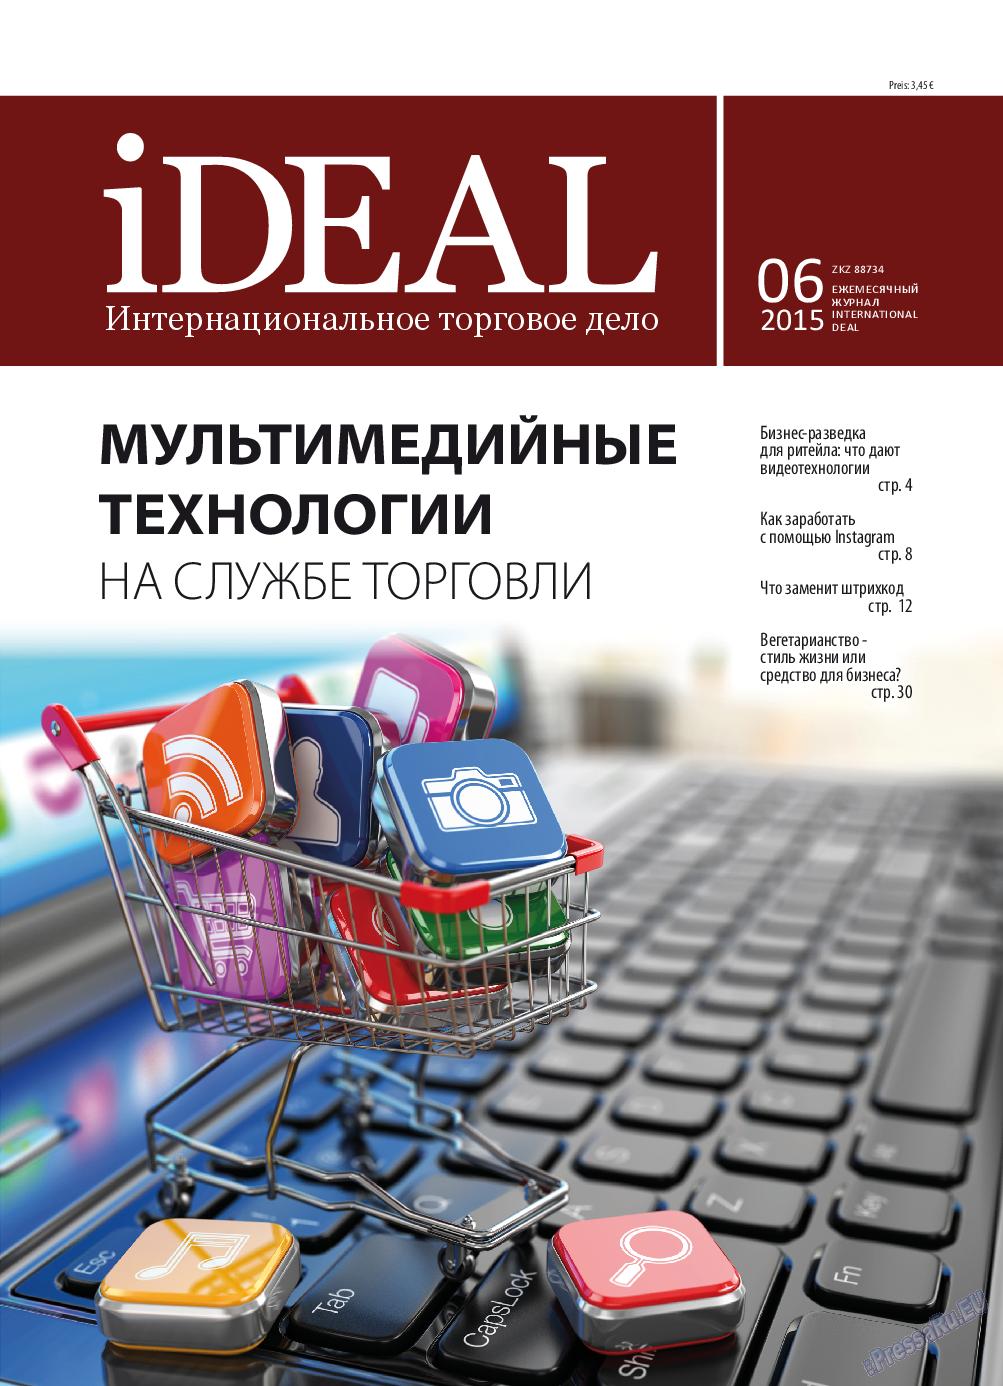 iDEAL (журнал). 2015 год, номер 6, стр. 1